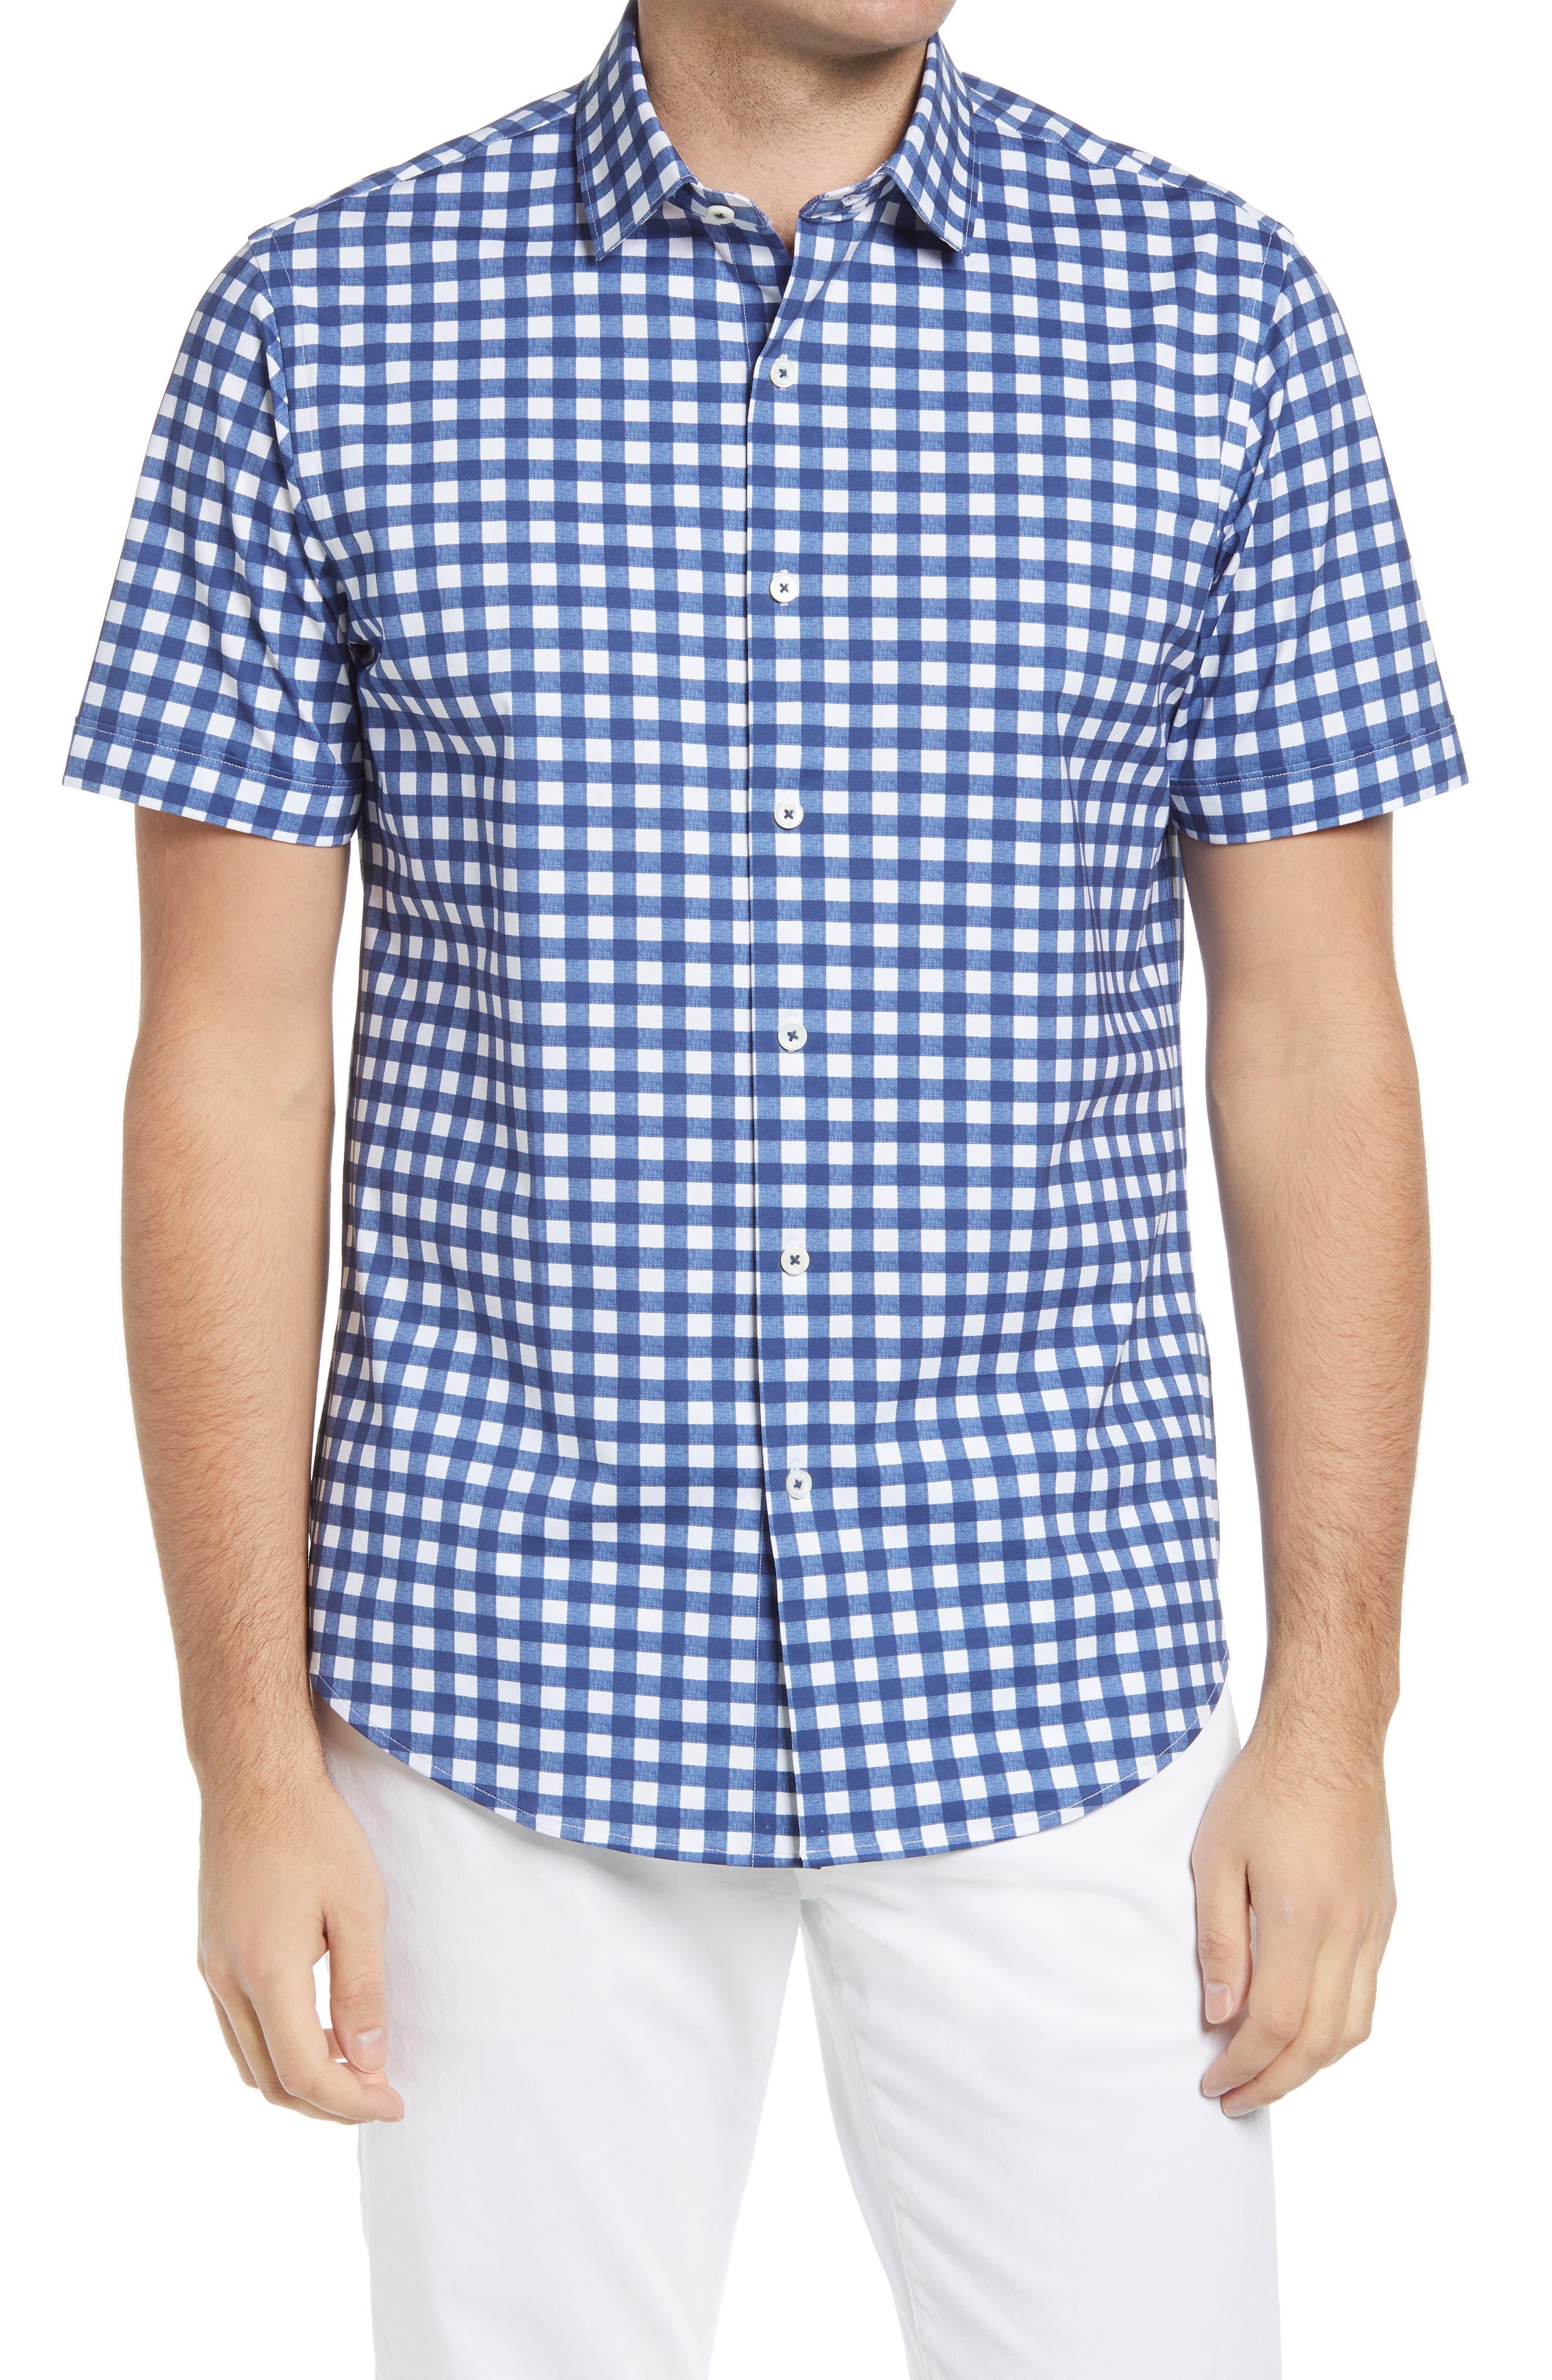 Designer Mens Gloss Shirt Underwired Lightweight Mens Shirt MANY Satin Colours New Kent